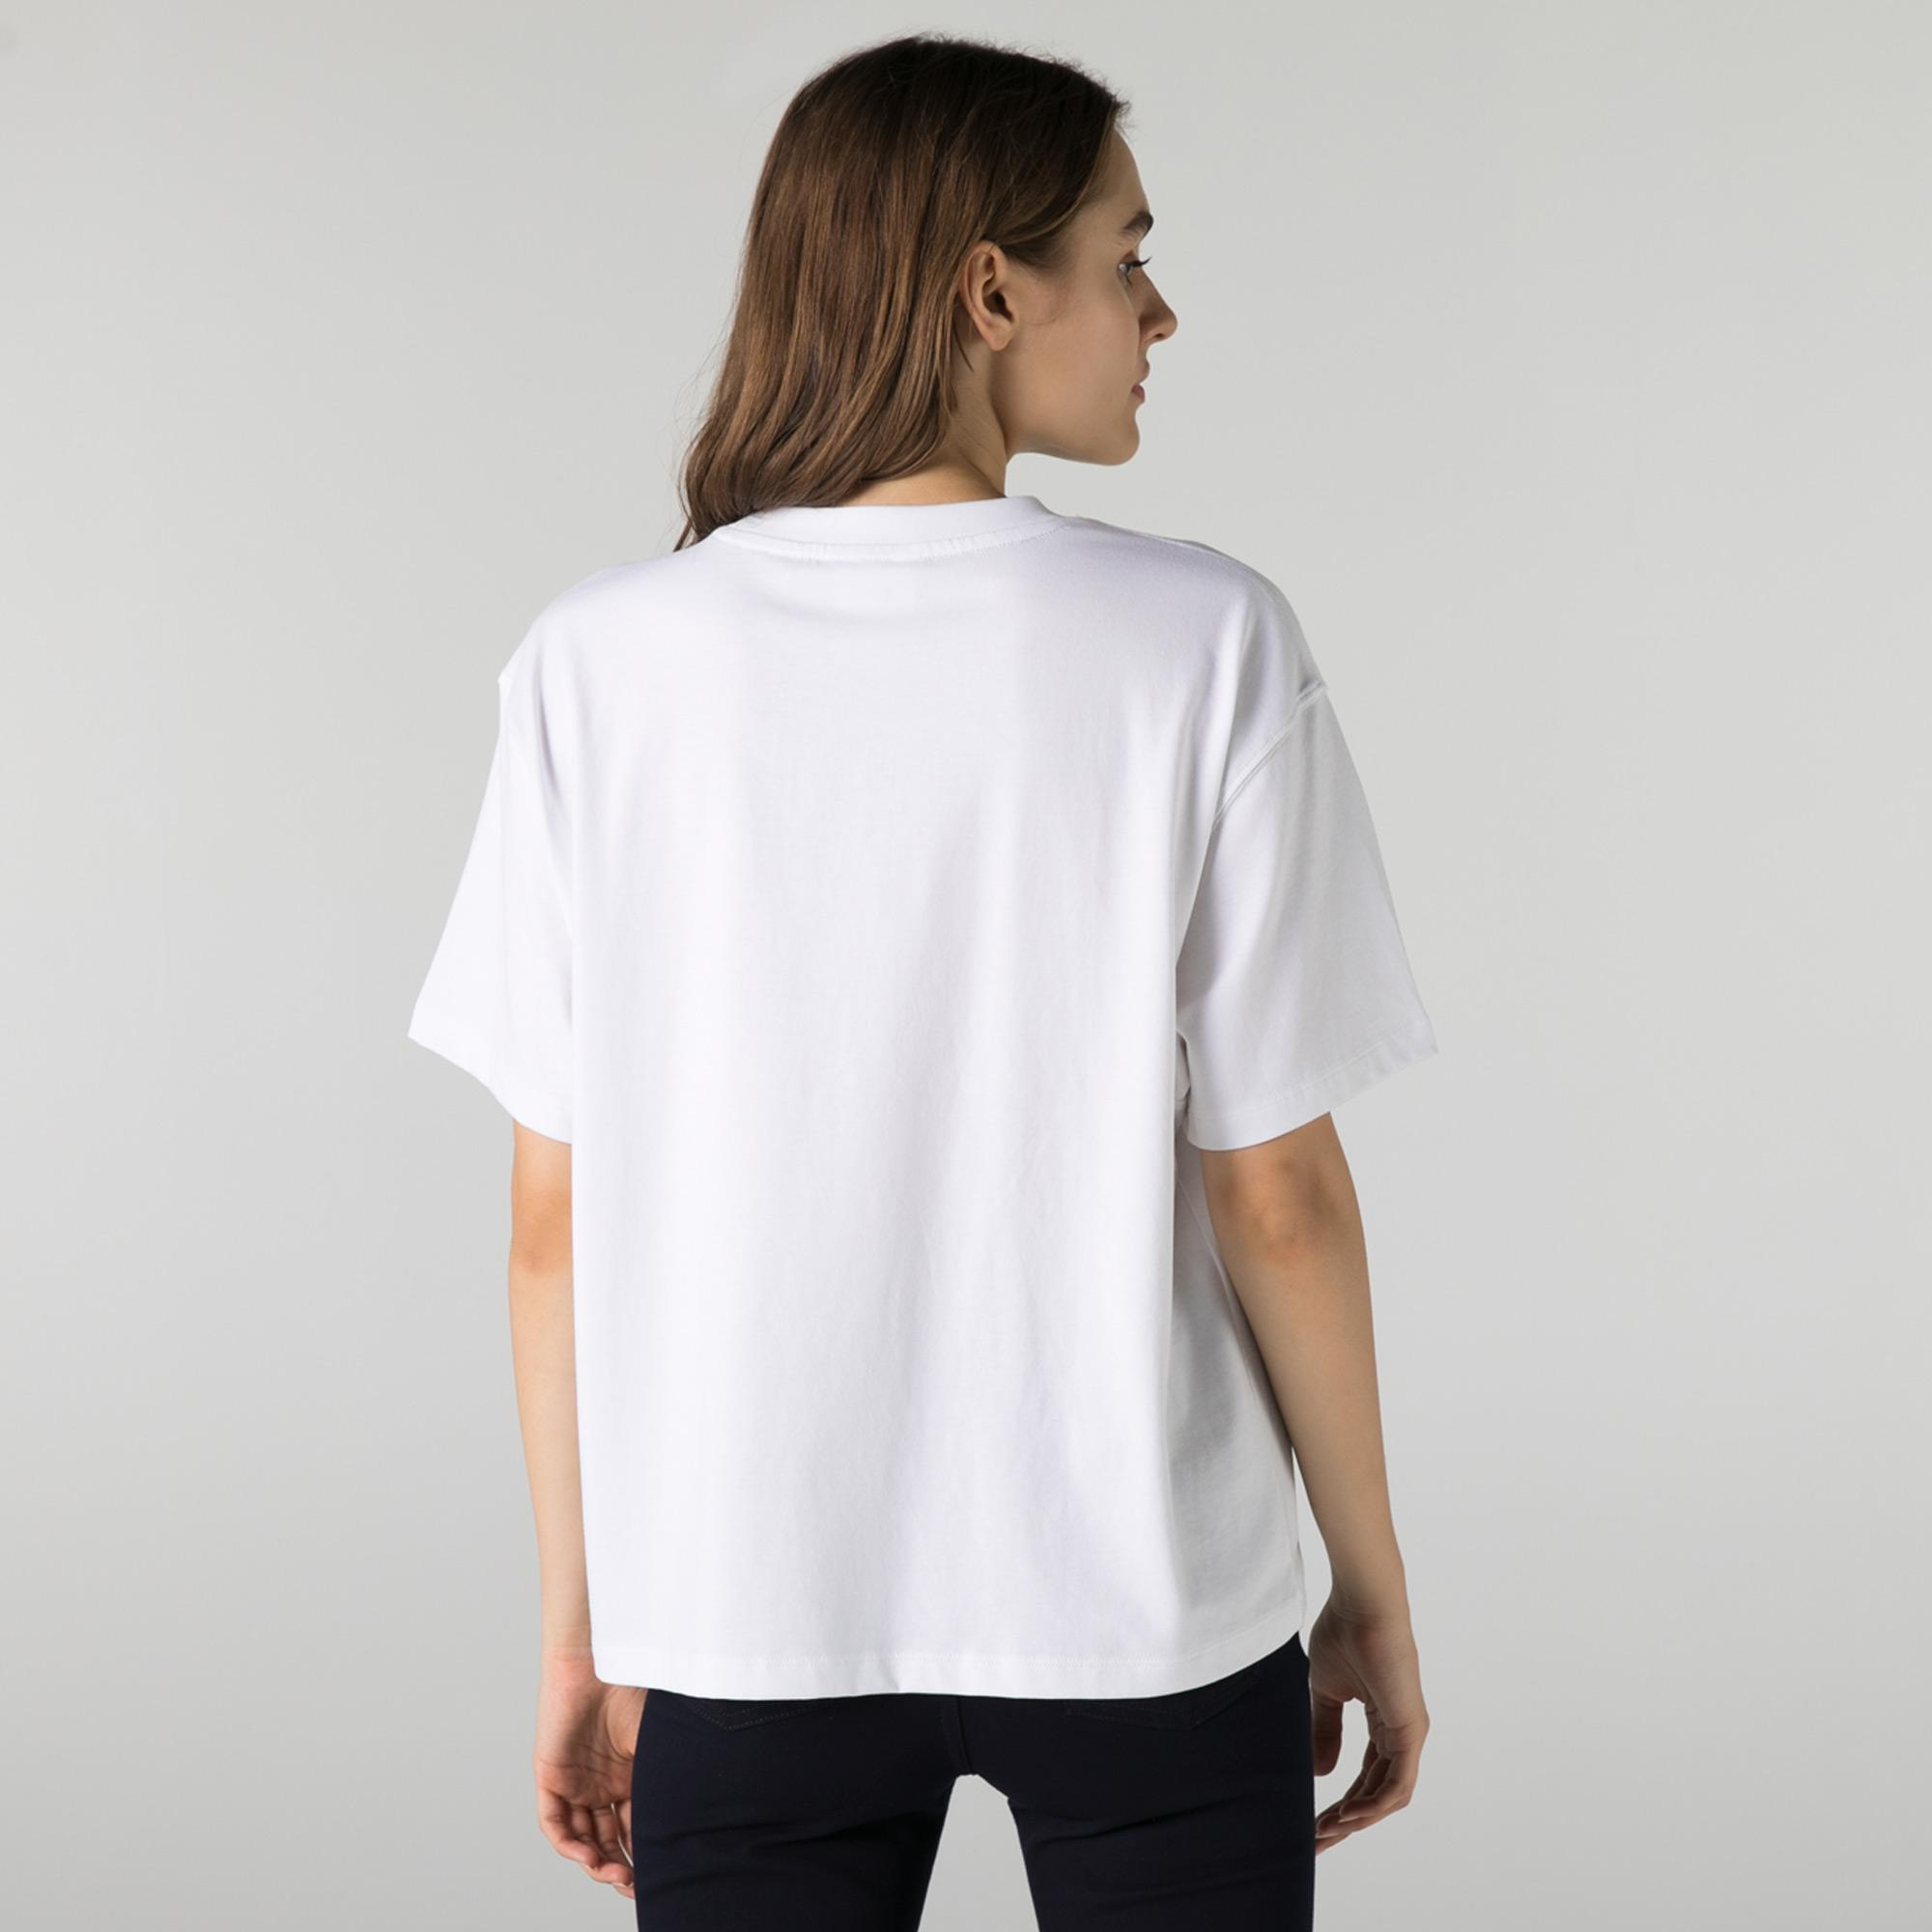 Lacoste L!VE Kadın Loose Fit Bisiklet Yaka Beyaz T-Shirt